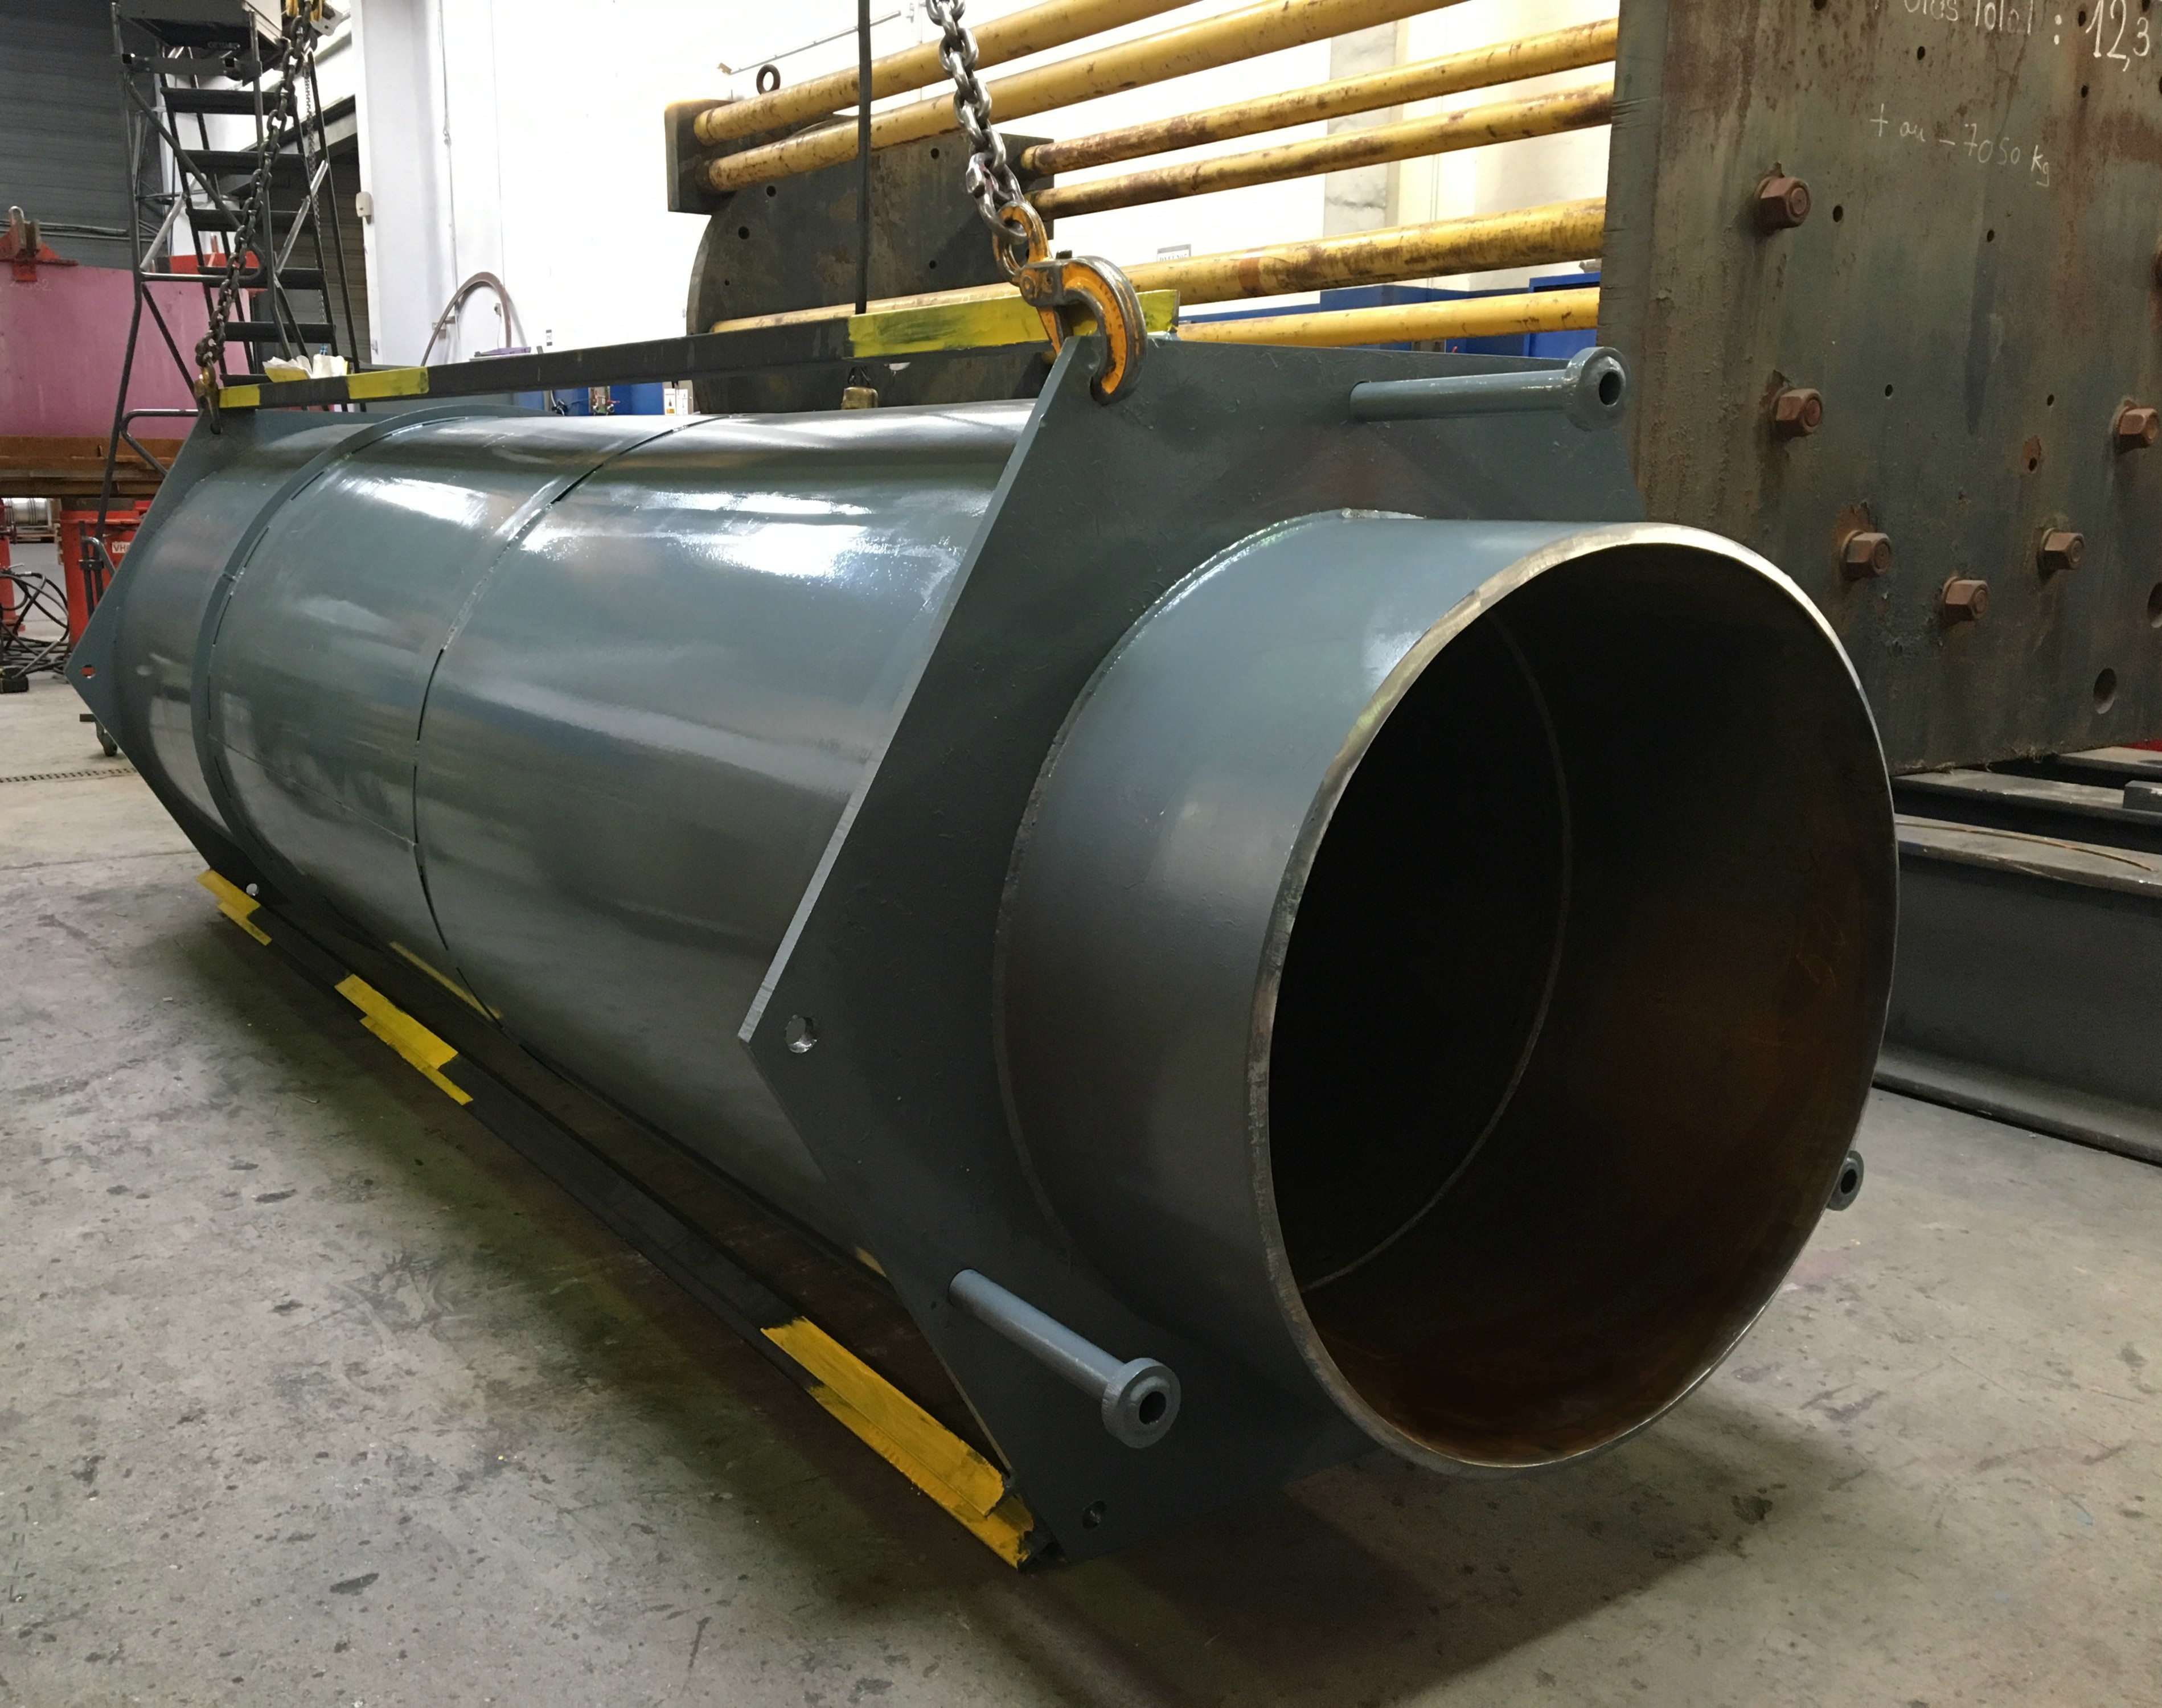 SFZ - Compensateur chauffage urbain - Diamètre 950 mm - Vapeur 20 bar